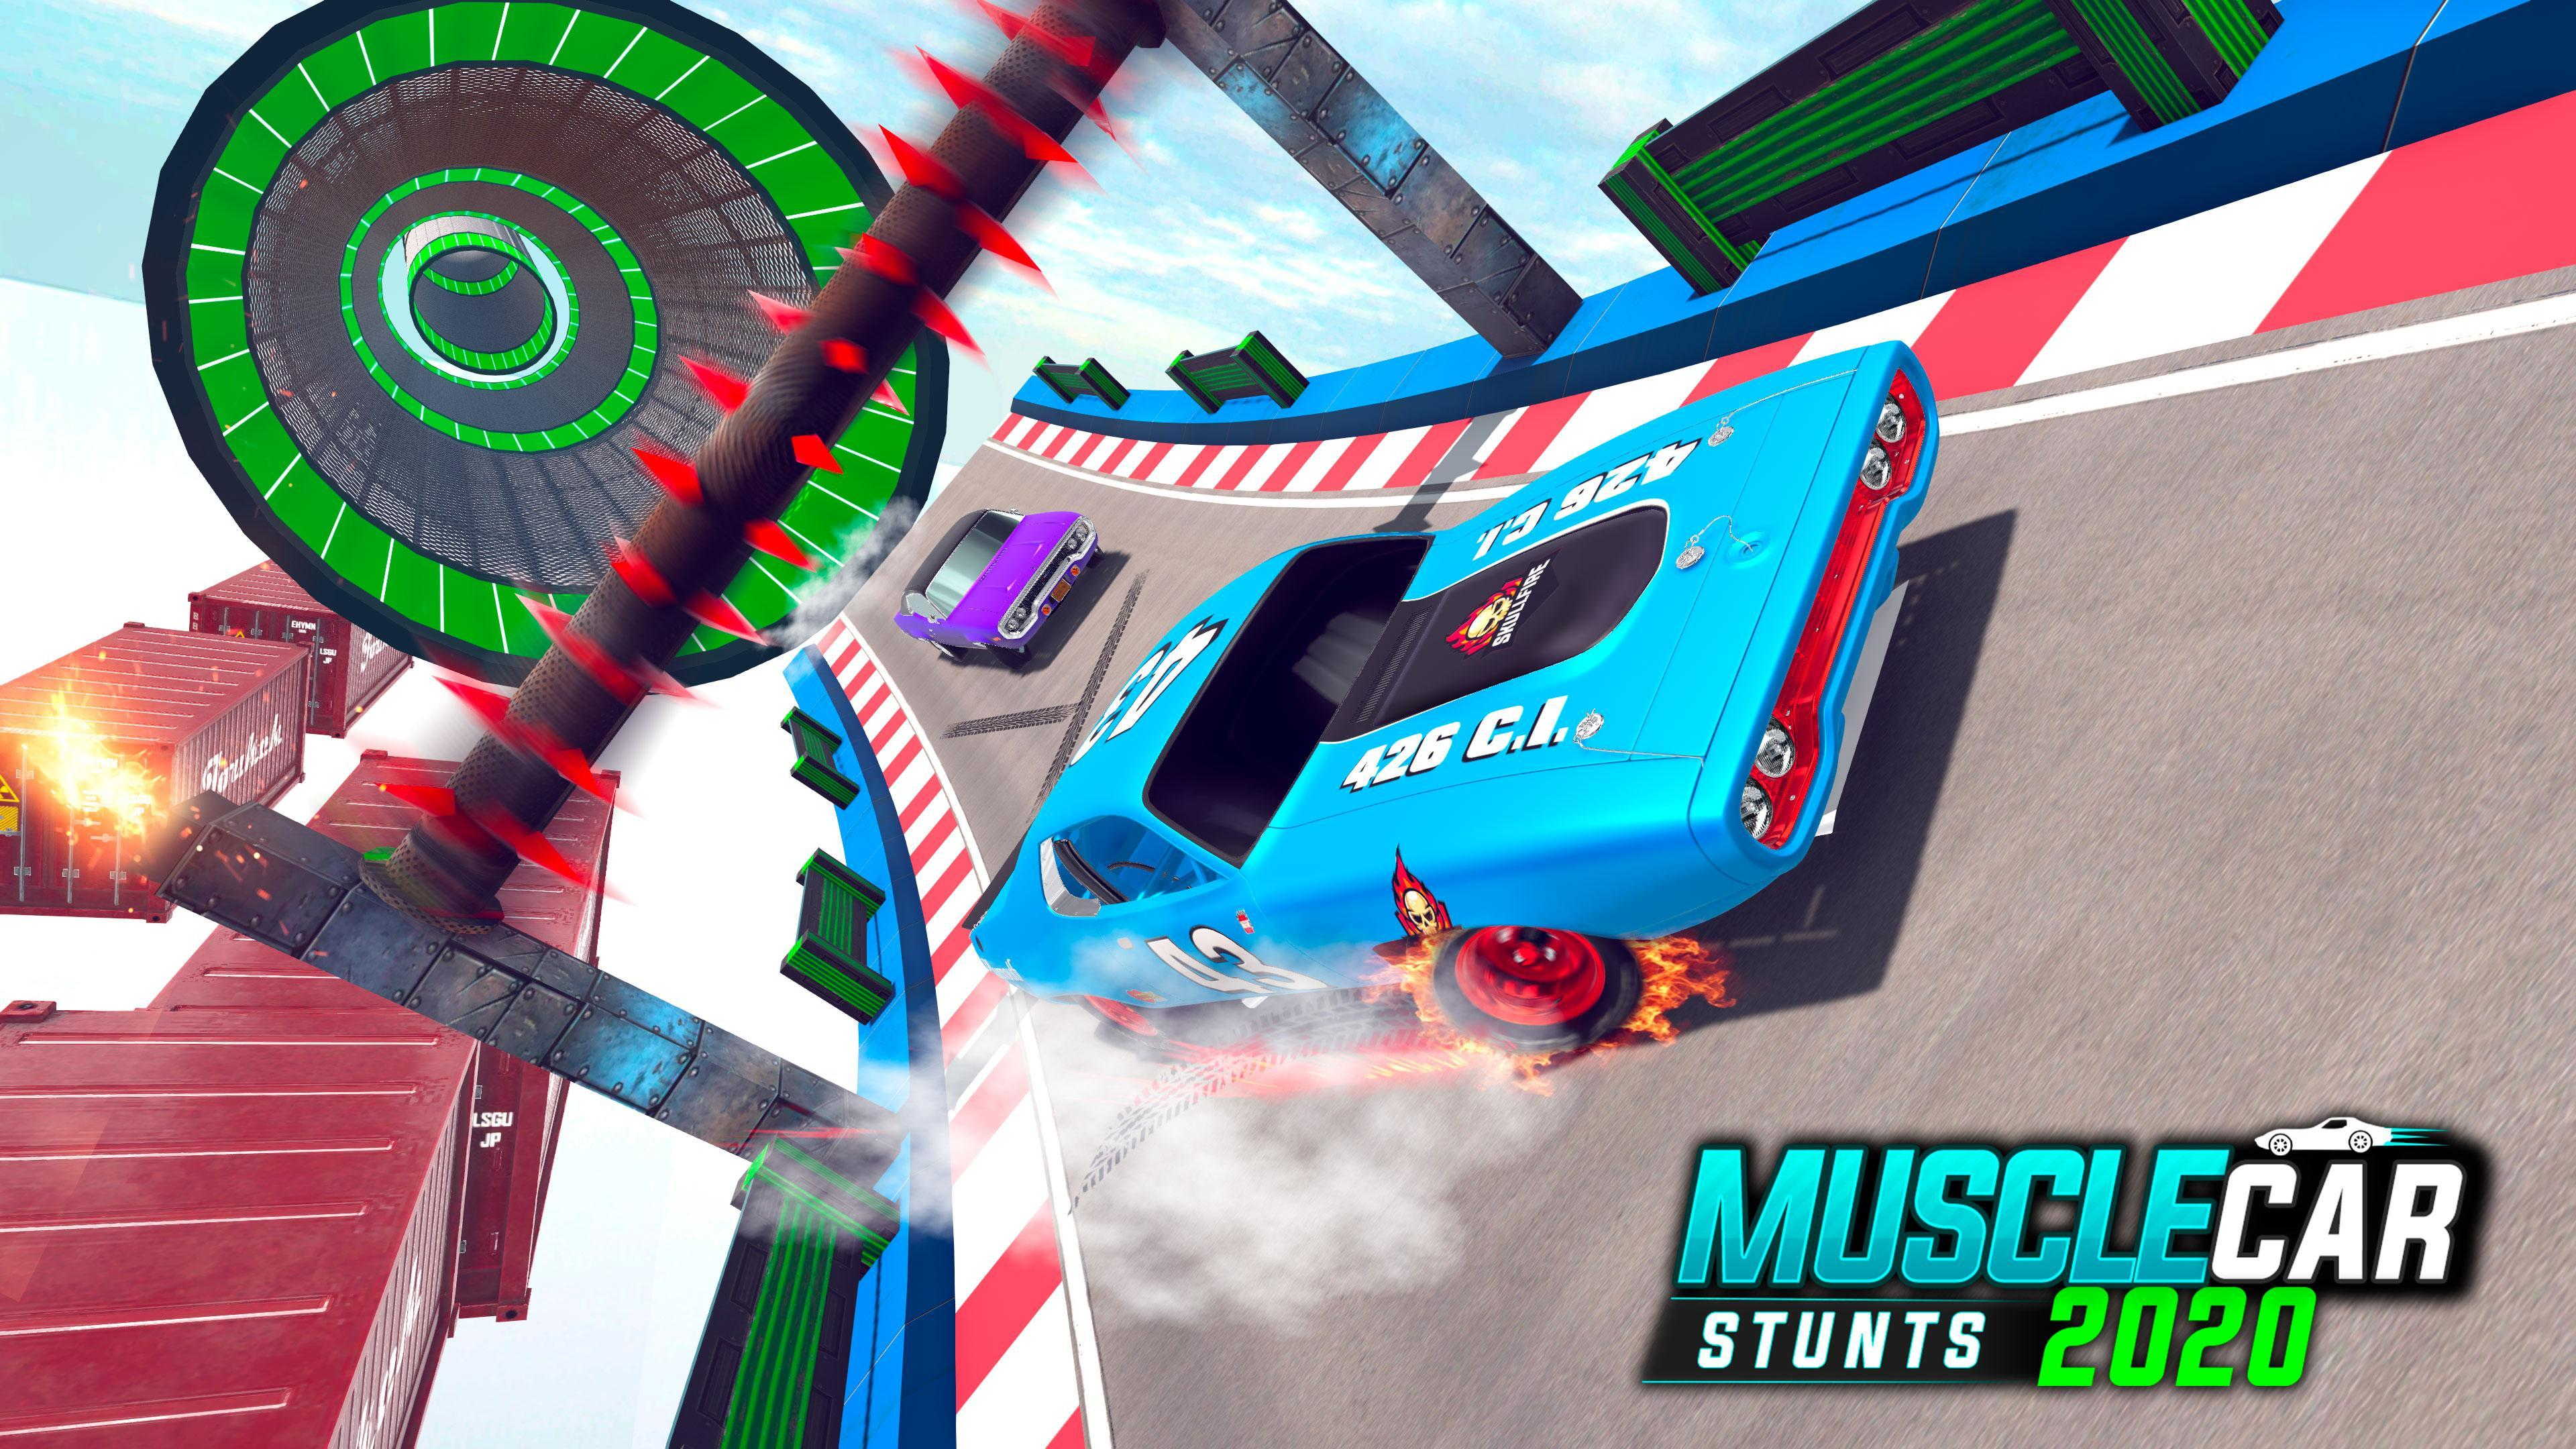 Muscle Car Stunts 2020 Mega Ramp Stunt Car Games 1.0.9 Screenshot 16